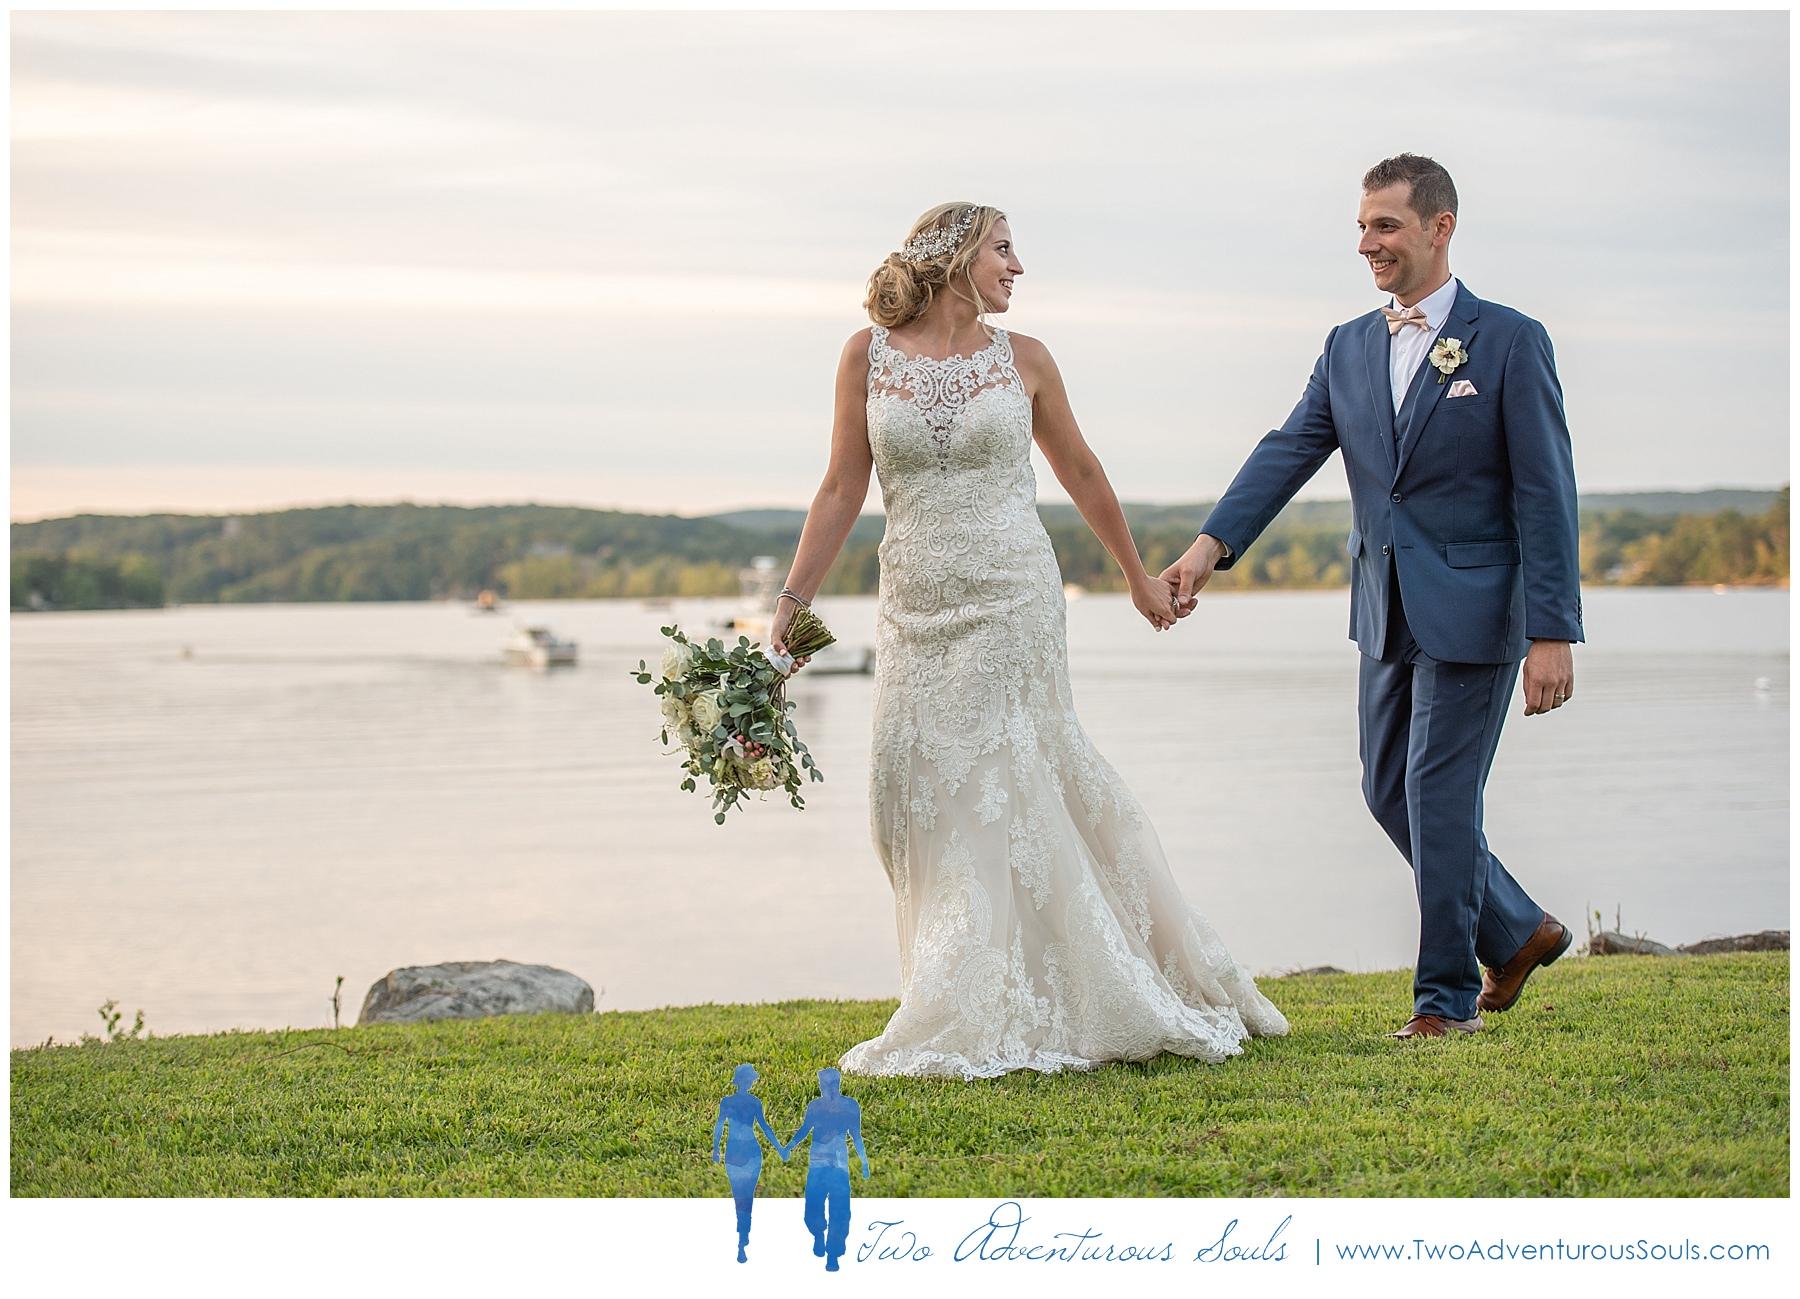 Connecticut Wedding Photographers, Lace Factory Wedding Photographers, Two Adventurous Souls - 083119_0044.jpg